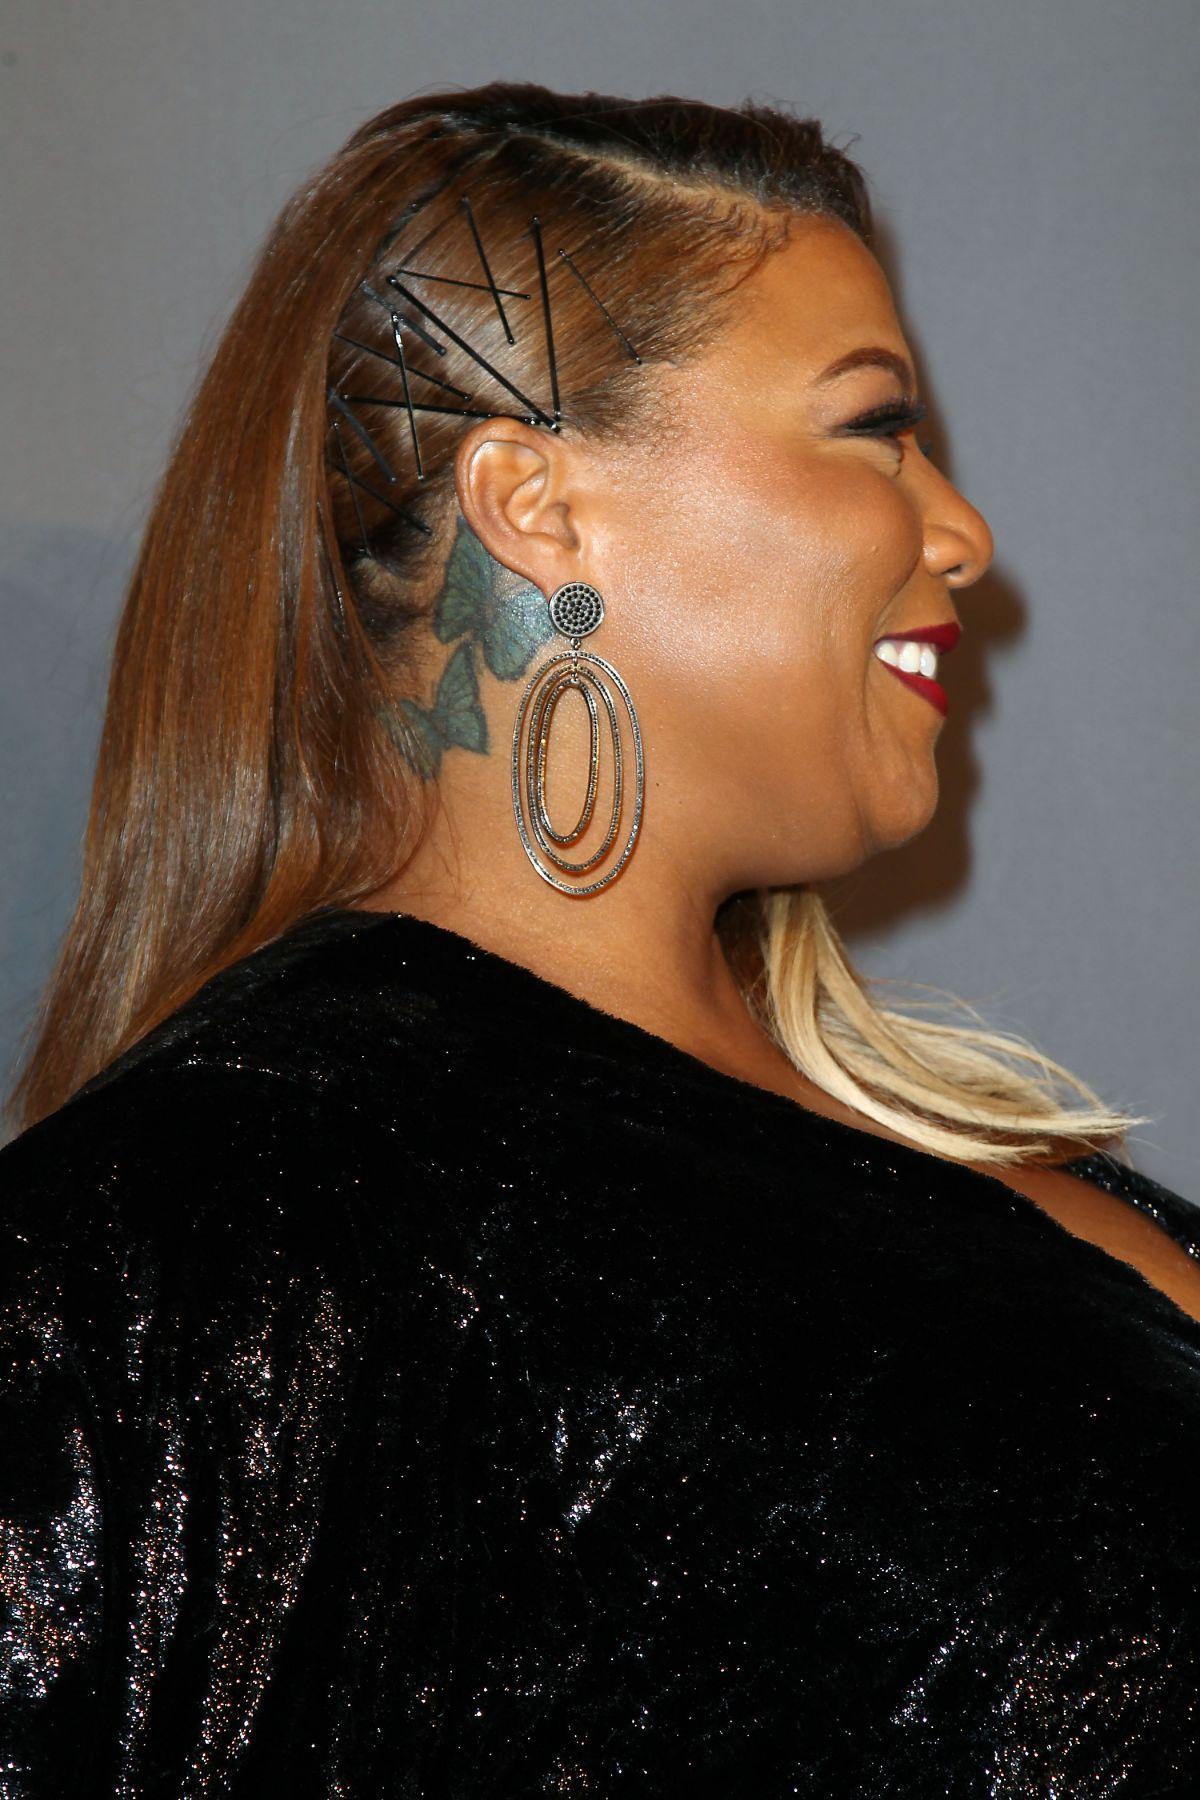 Queen Latifah At Amfar Gala 2018 In New York 02 07 2018 Hawtcelebs